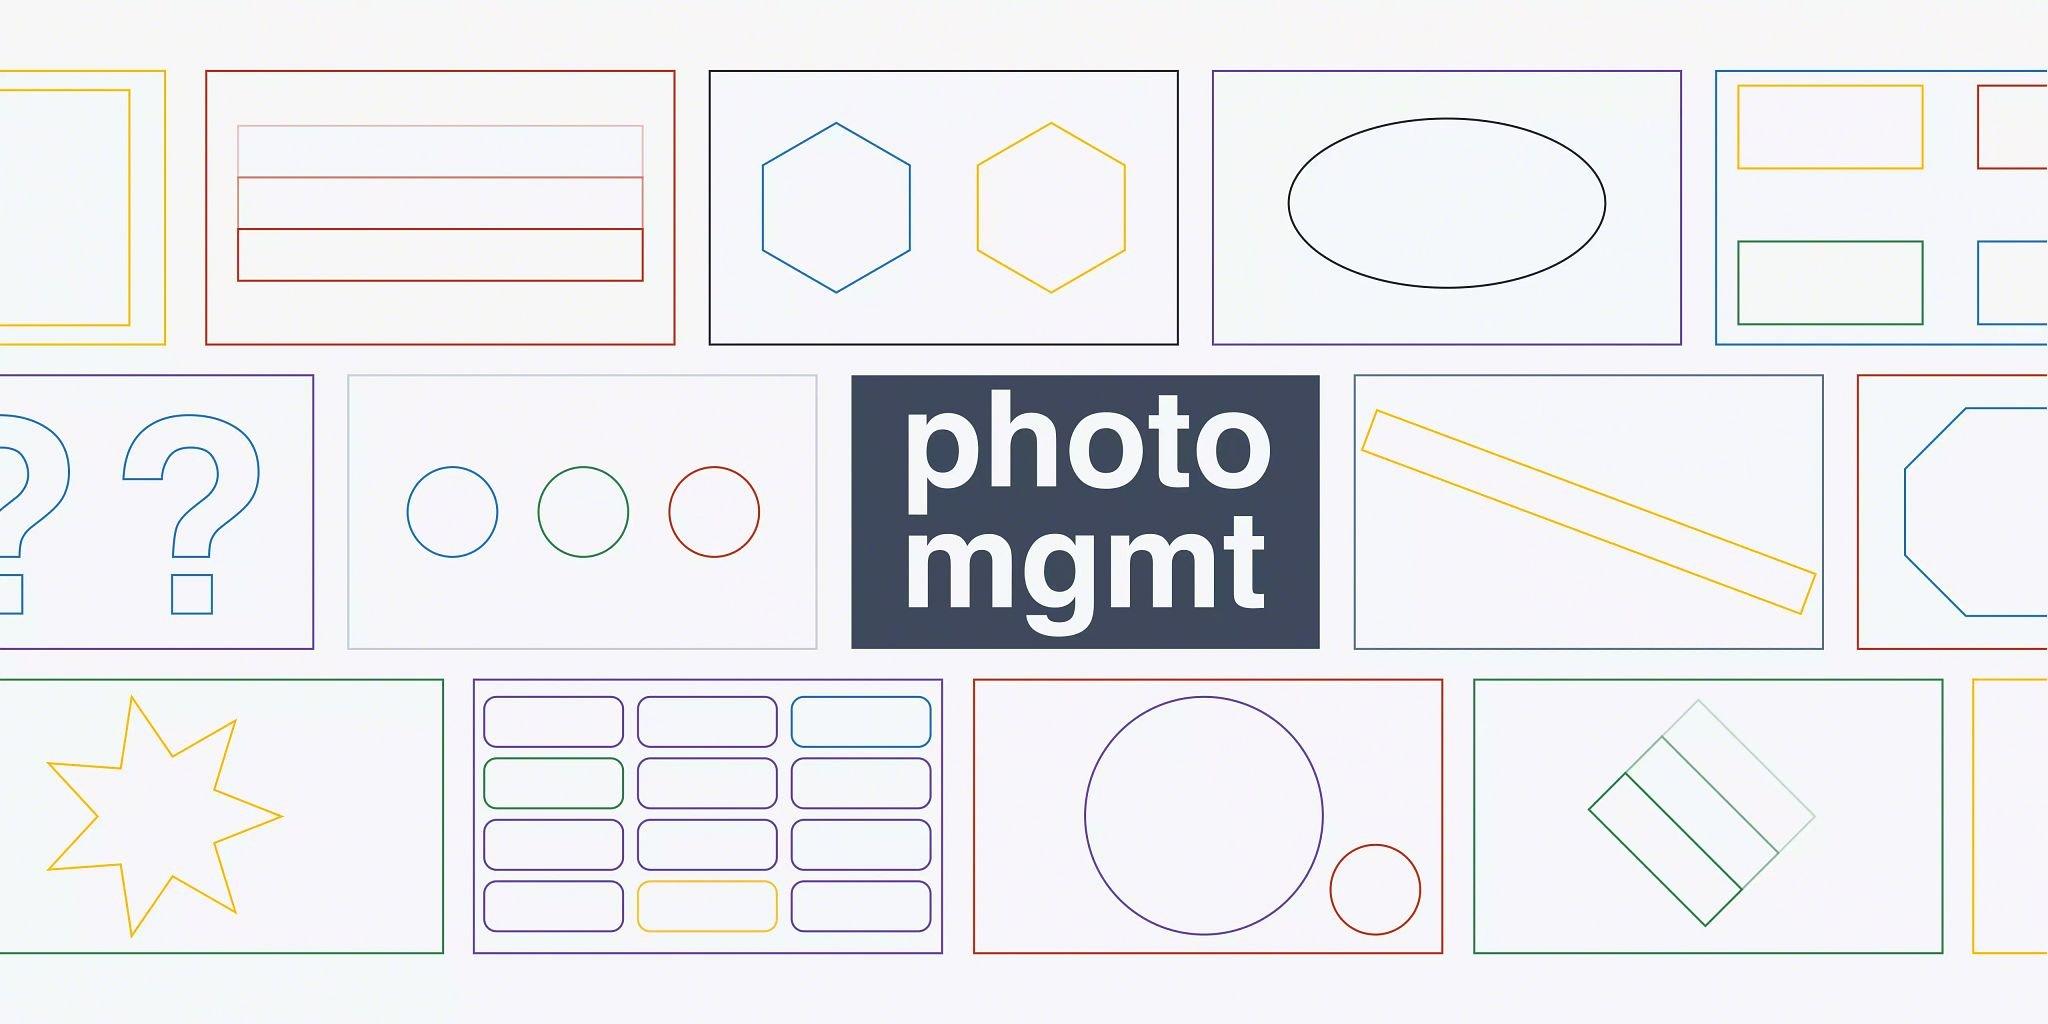 Blog header graphic: Photo management software